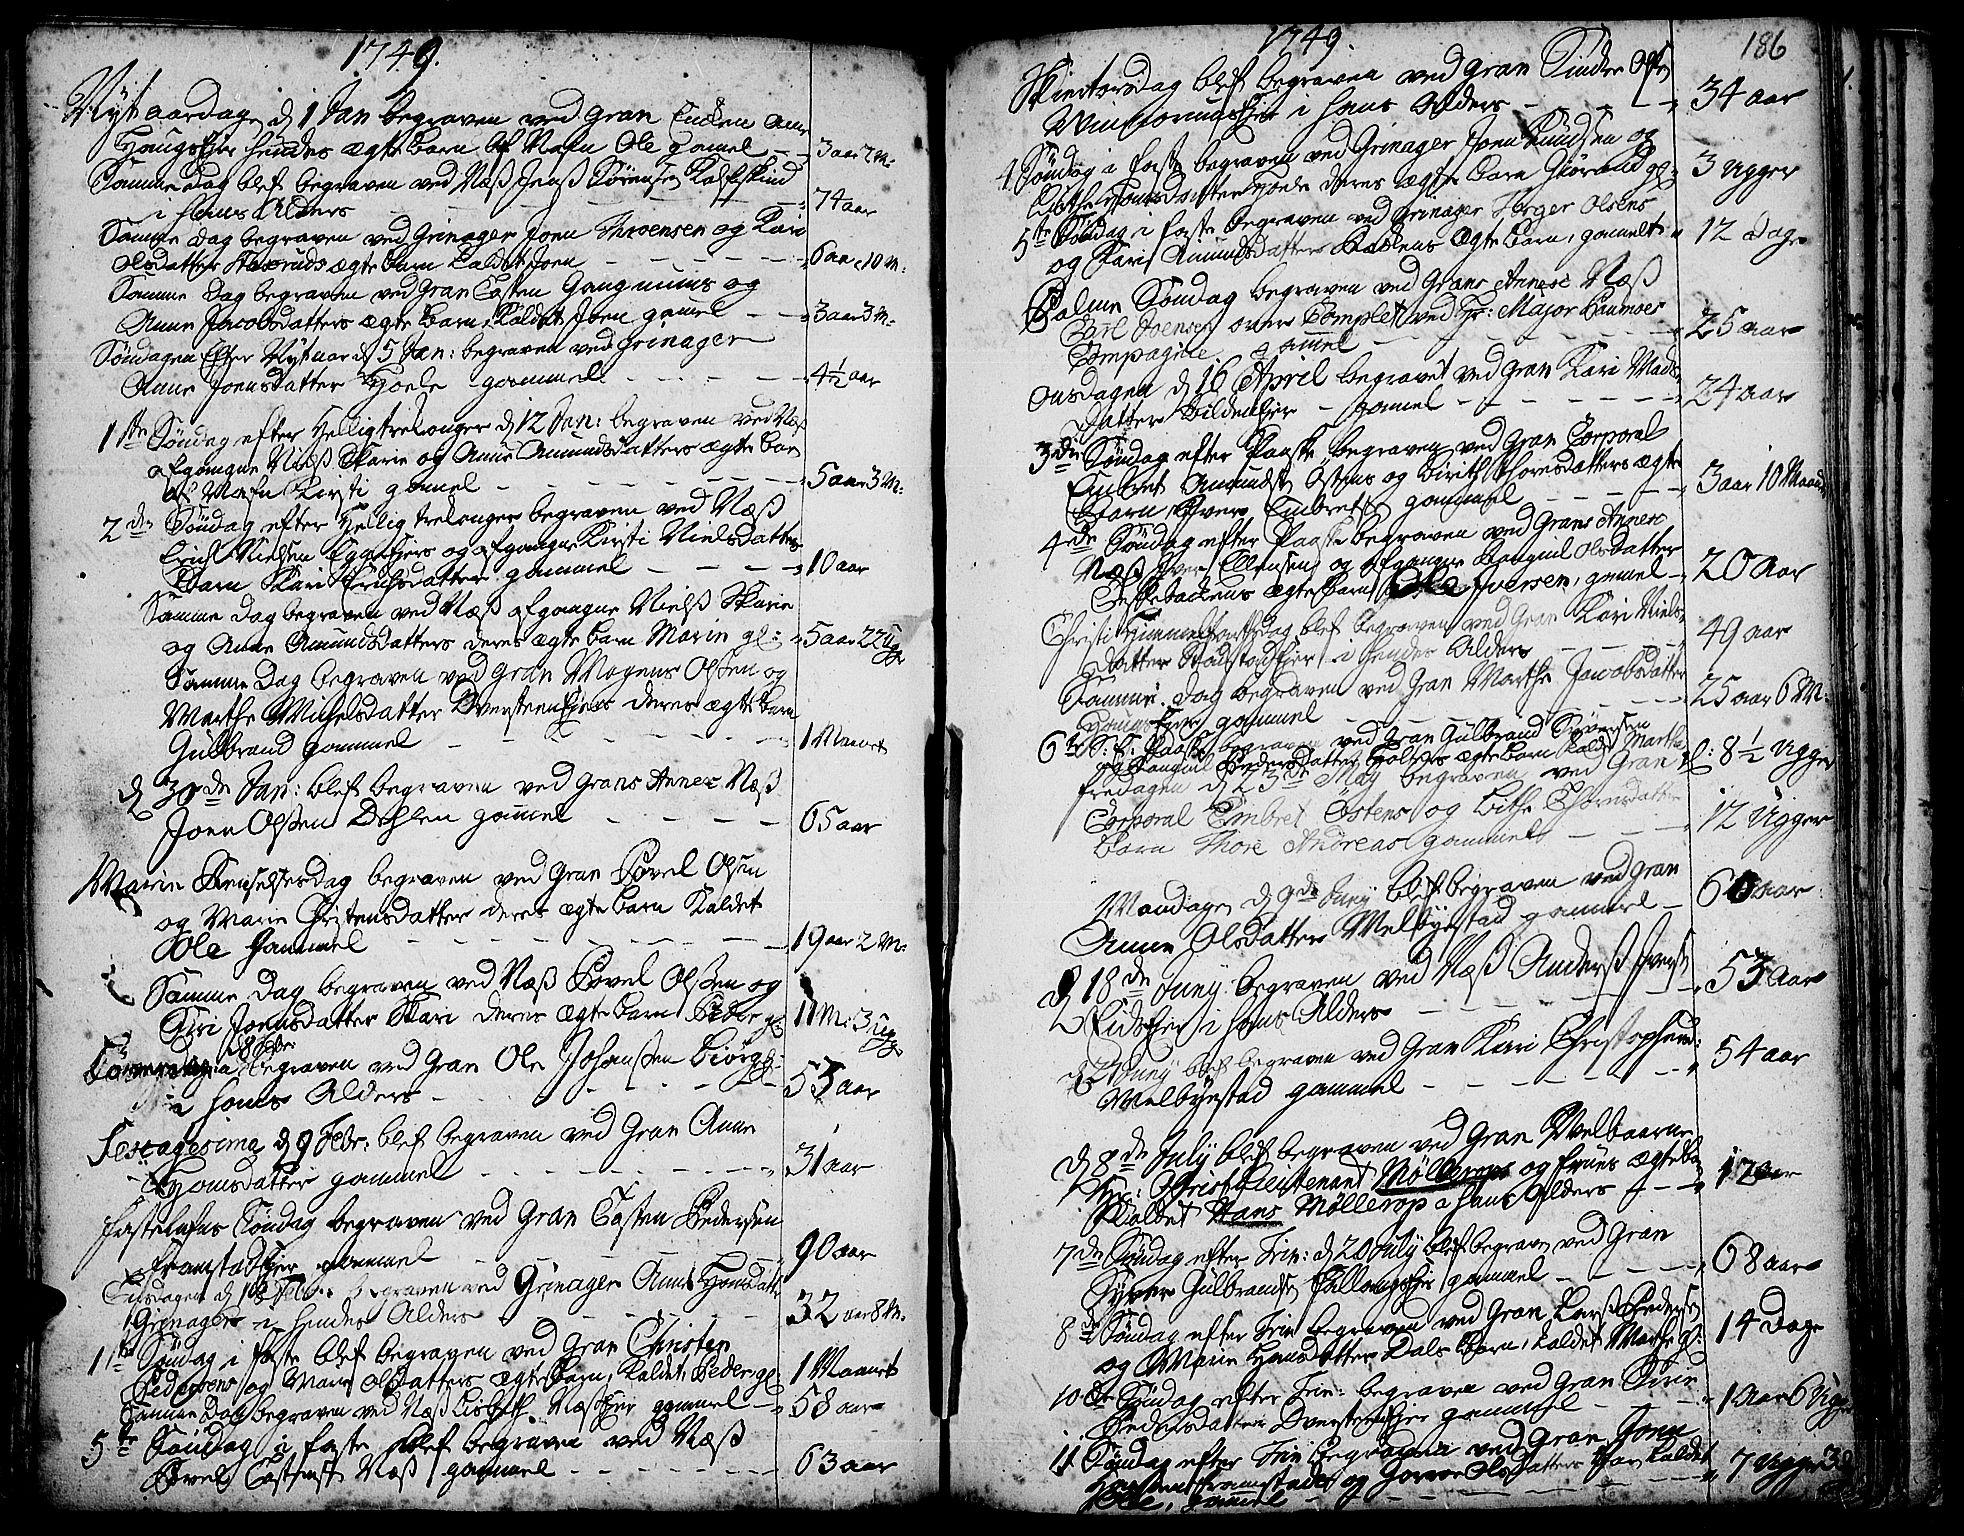 SAH, Gran prestekontor, Ministerialbok nr. 3, 1745-1758, s. 186